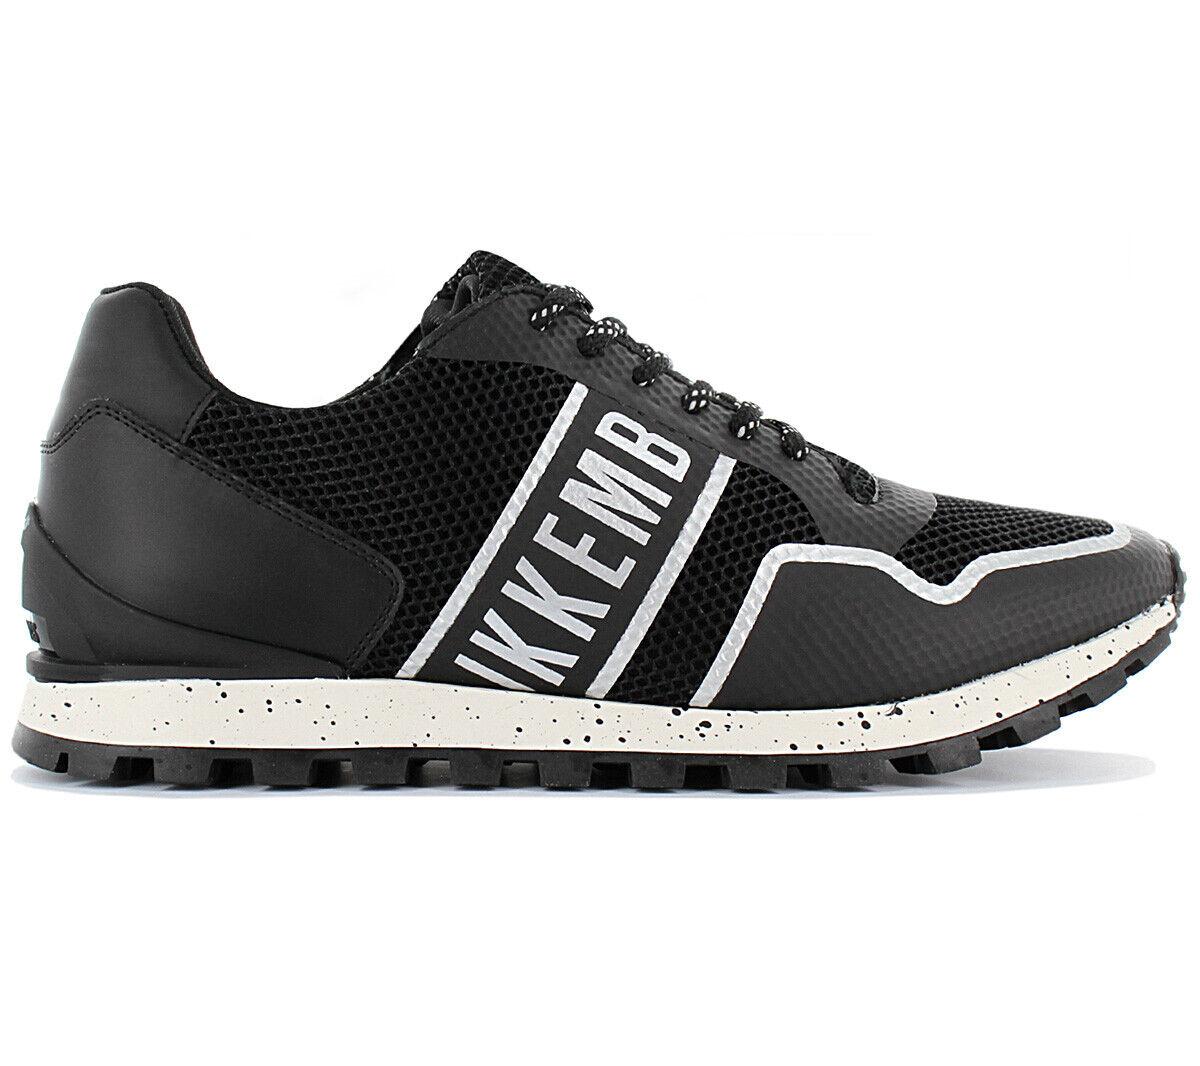 Bikkmberg Fend -Er 2084 Low Men's scarpe da ginnastica  Casual scarpe BKE109292 nero  sport caldi